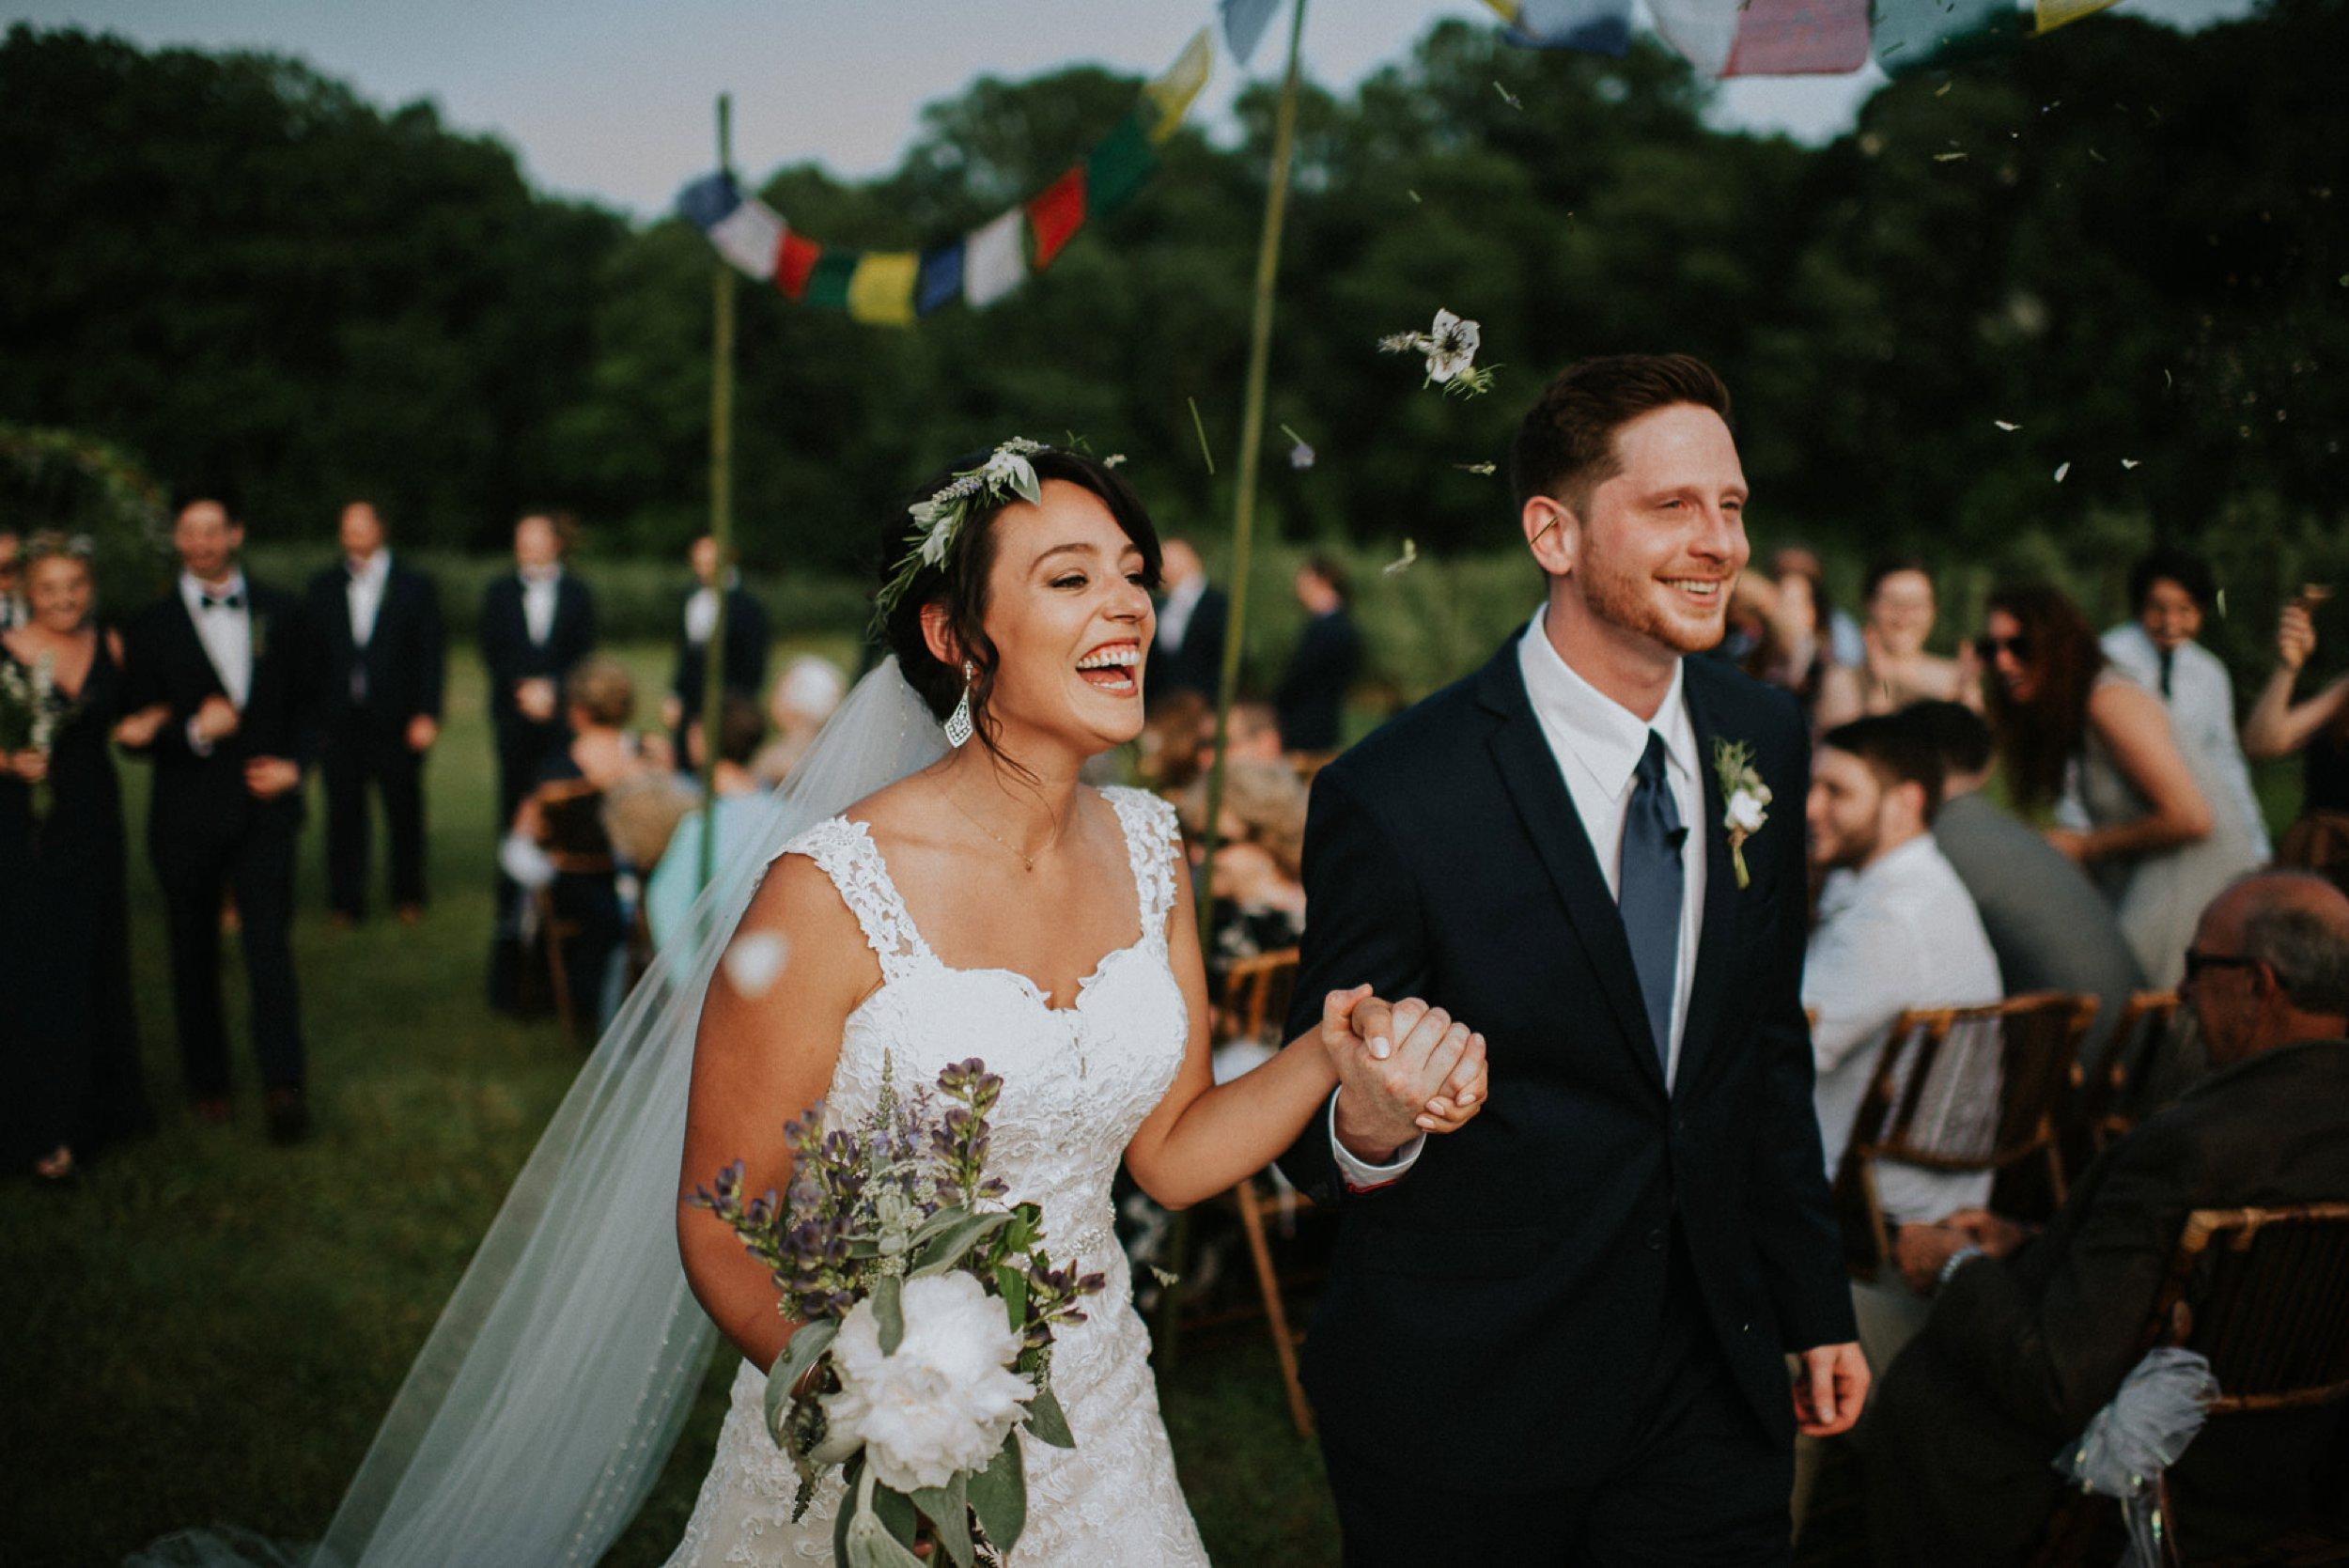 milburn_farms-wedding-44.jpg